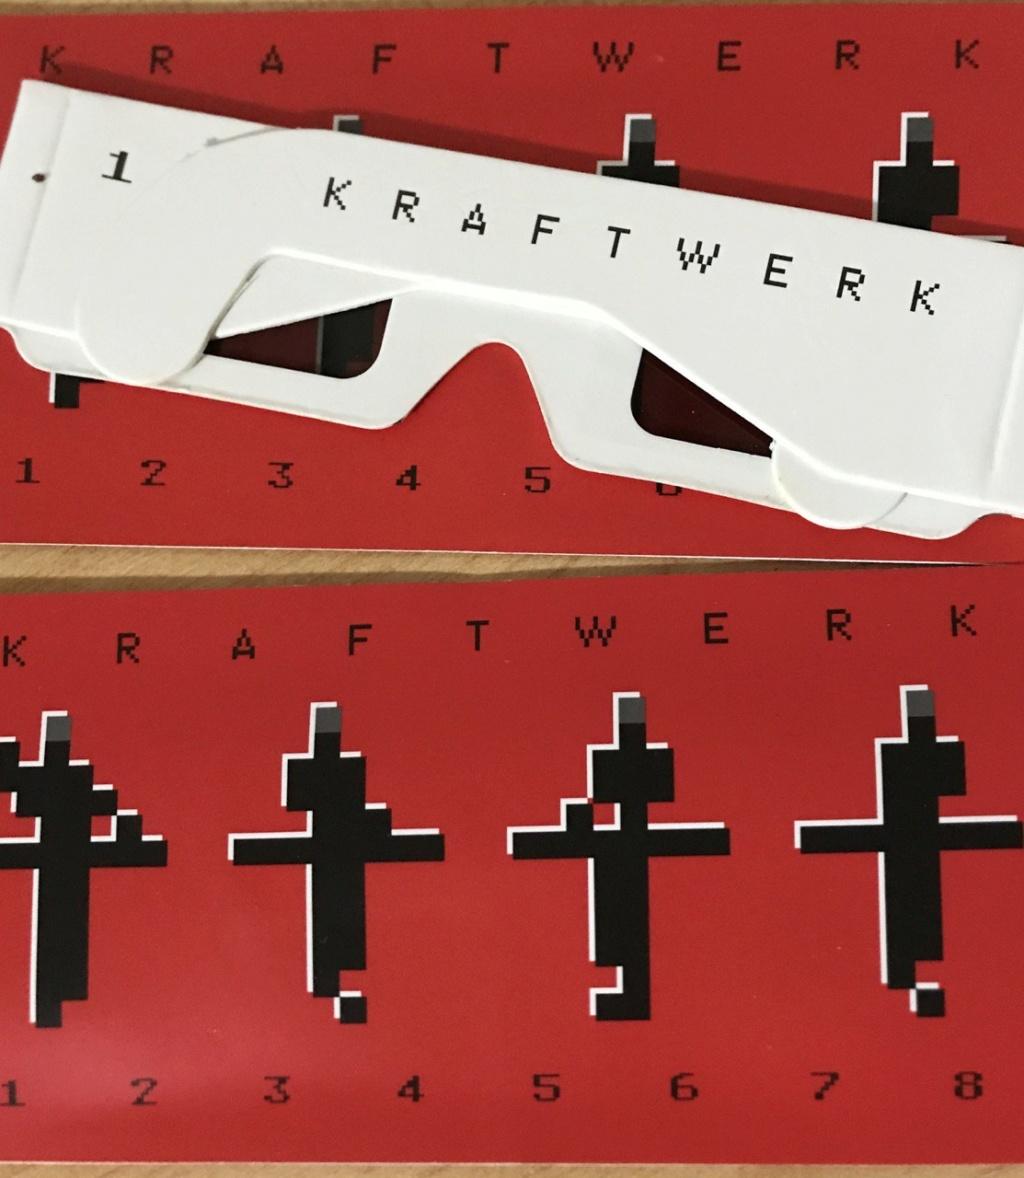 KRAFTWERK - Página 2 K10